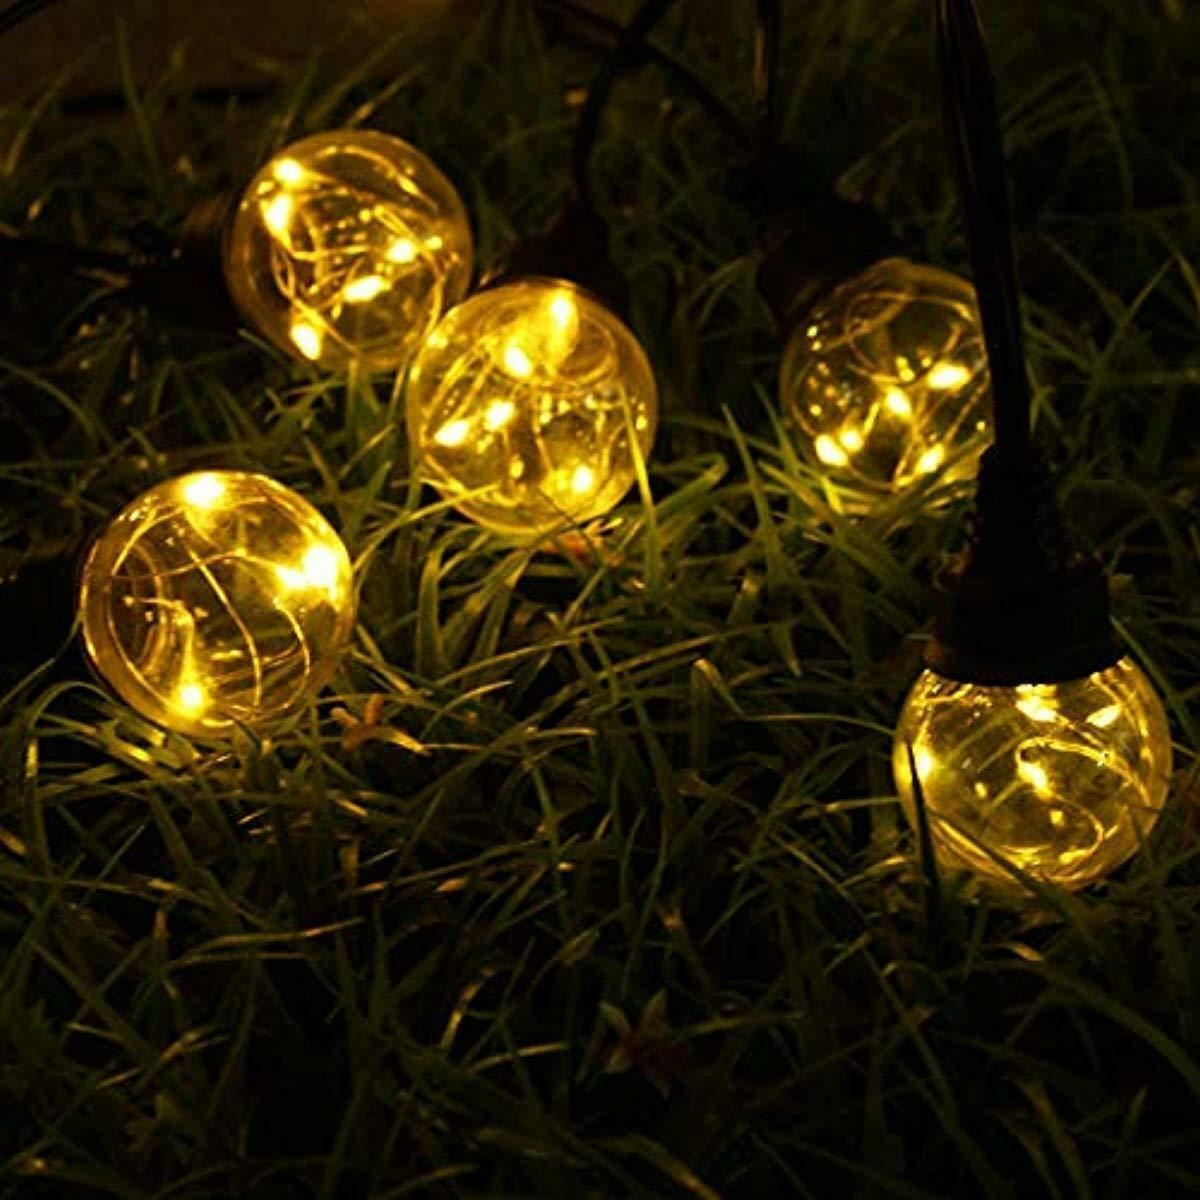 Solmore Guirlande Lumineuse 9.2M 25 Boules Led G45 Ampoule ... concernant Boule Lumineuse Jardin